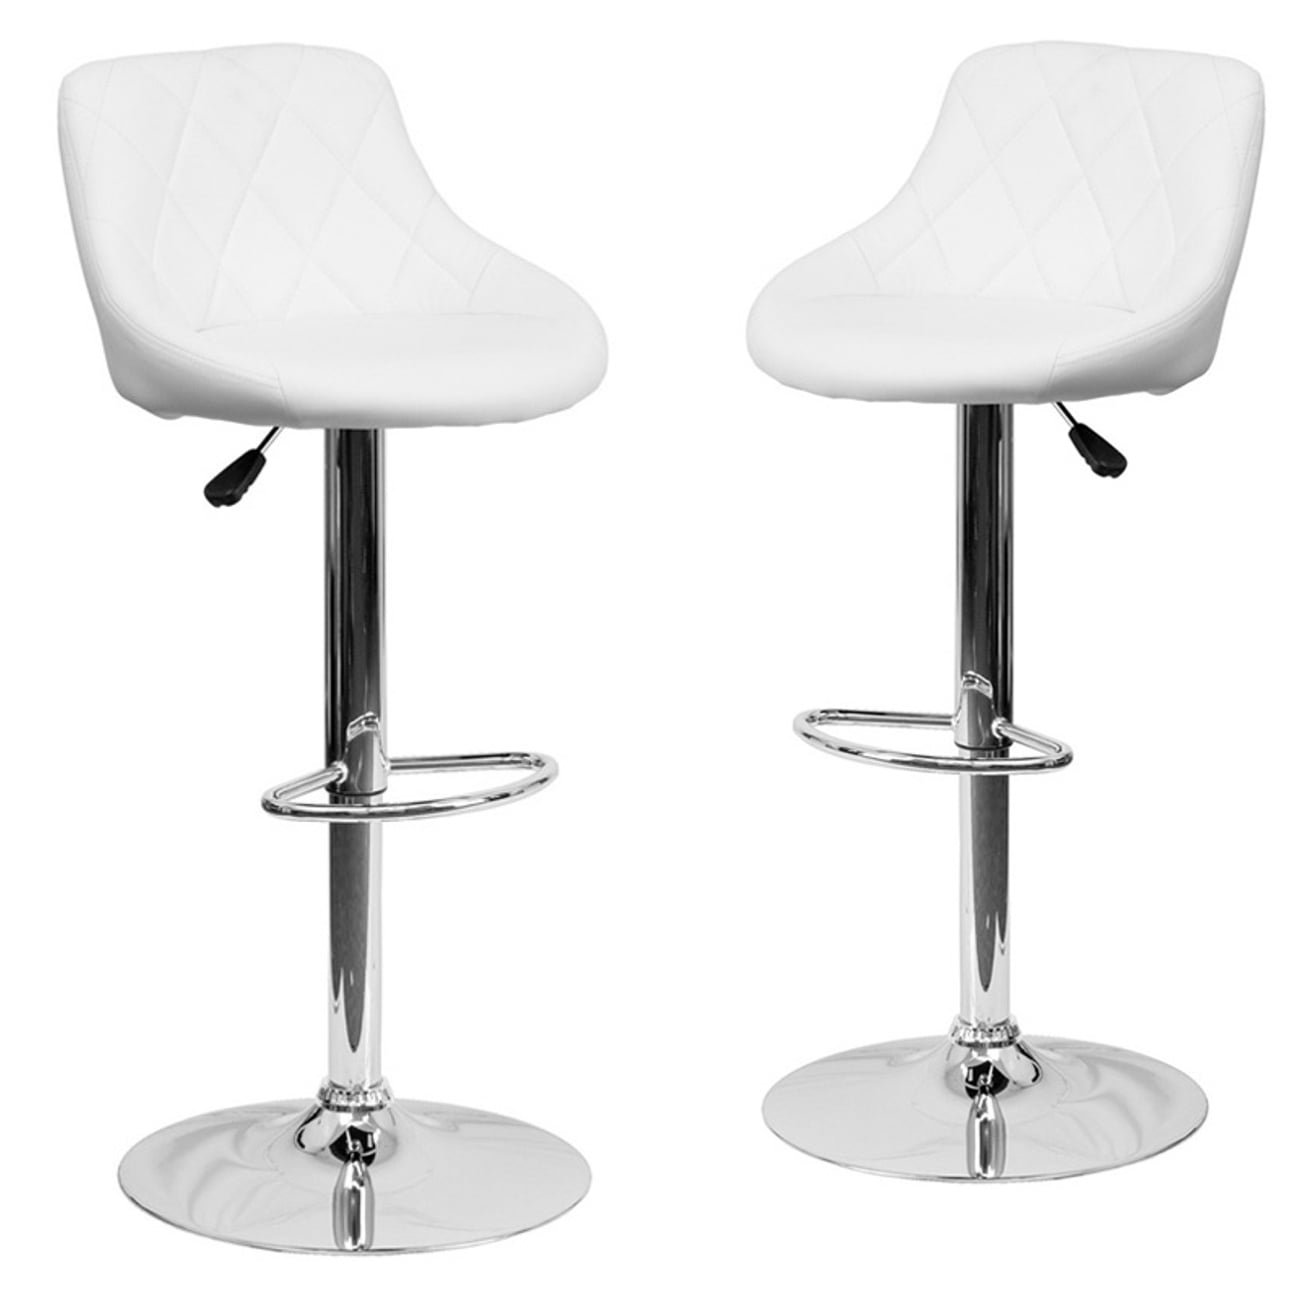 Brilliant Belleze Set Of 2 Modern Adjustable Bar Stool Bucket Seat Swivel Footrest White Pdpeps Interior Chair Design Pdpepsorg